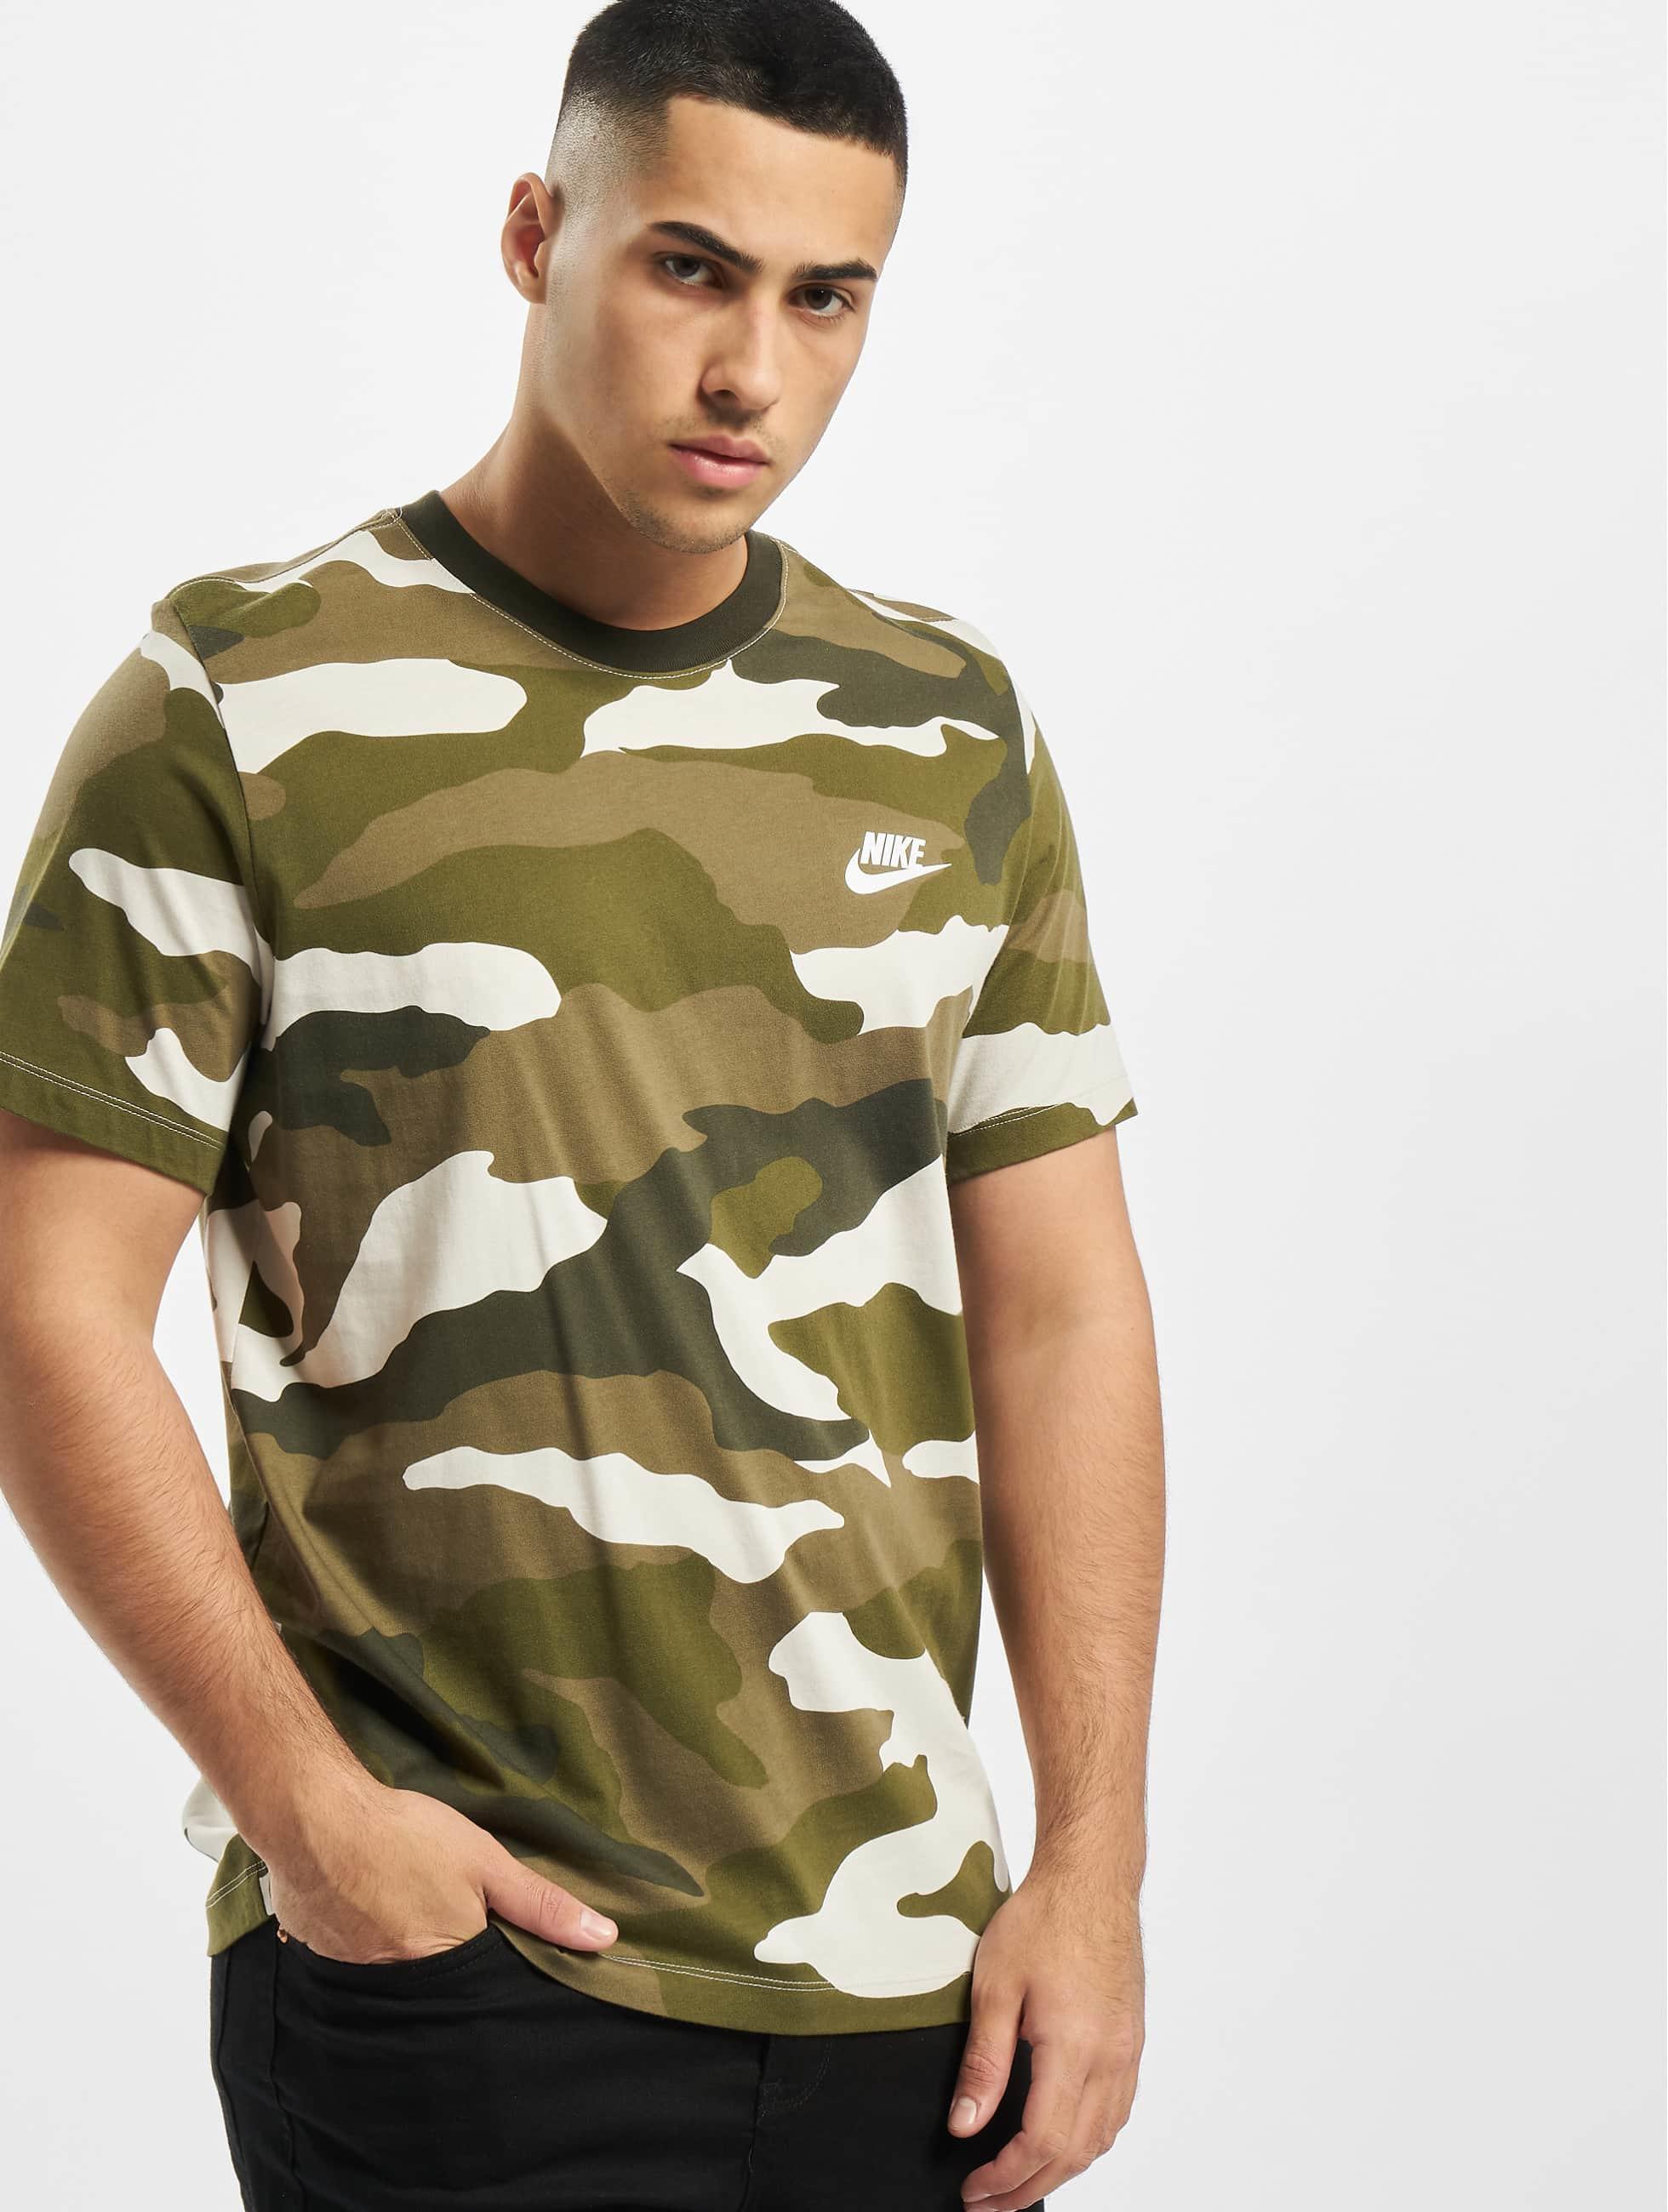 Nike Camo AOP T Shirt Light BoneMedium OliveWhite